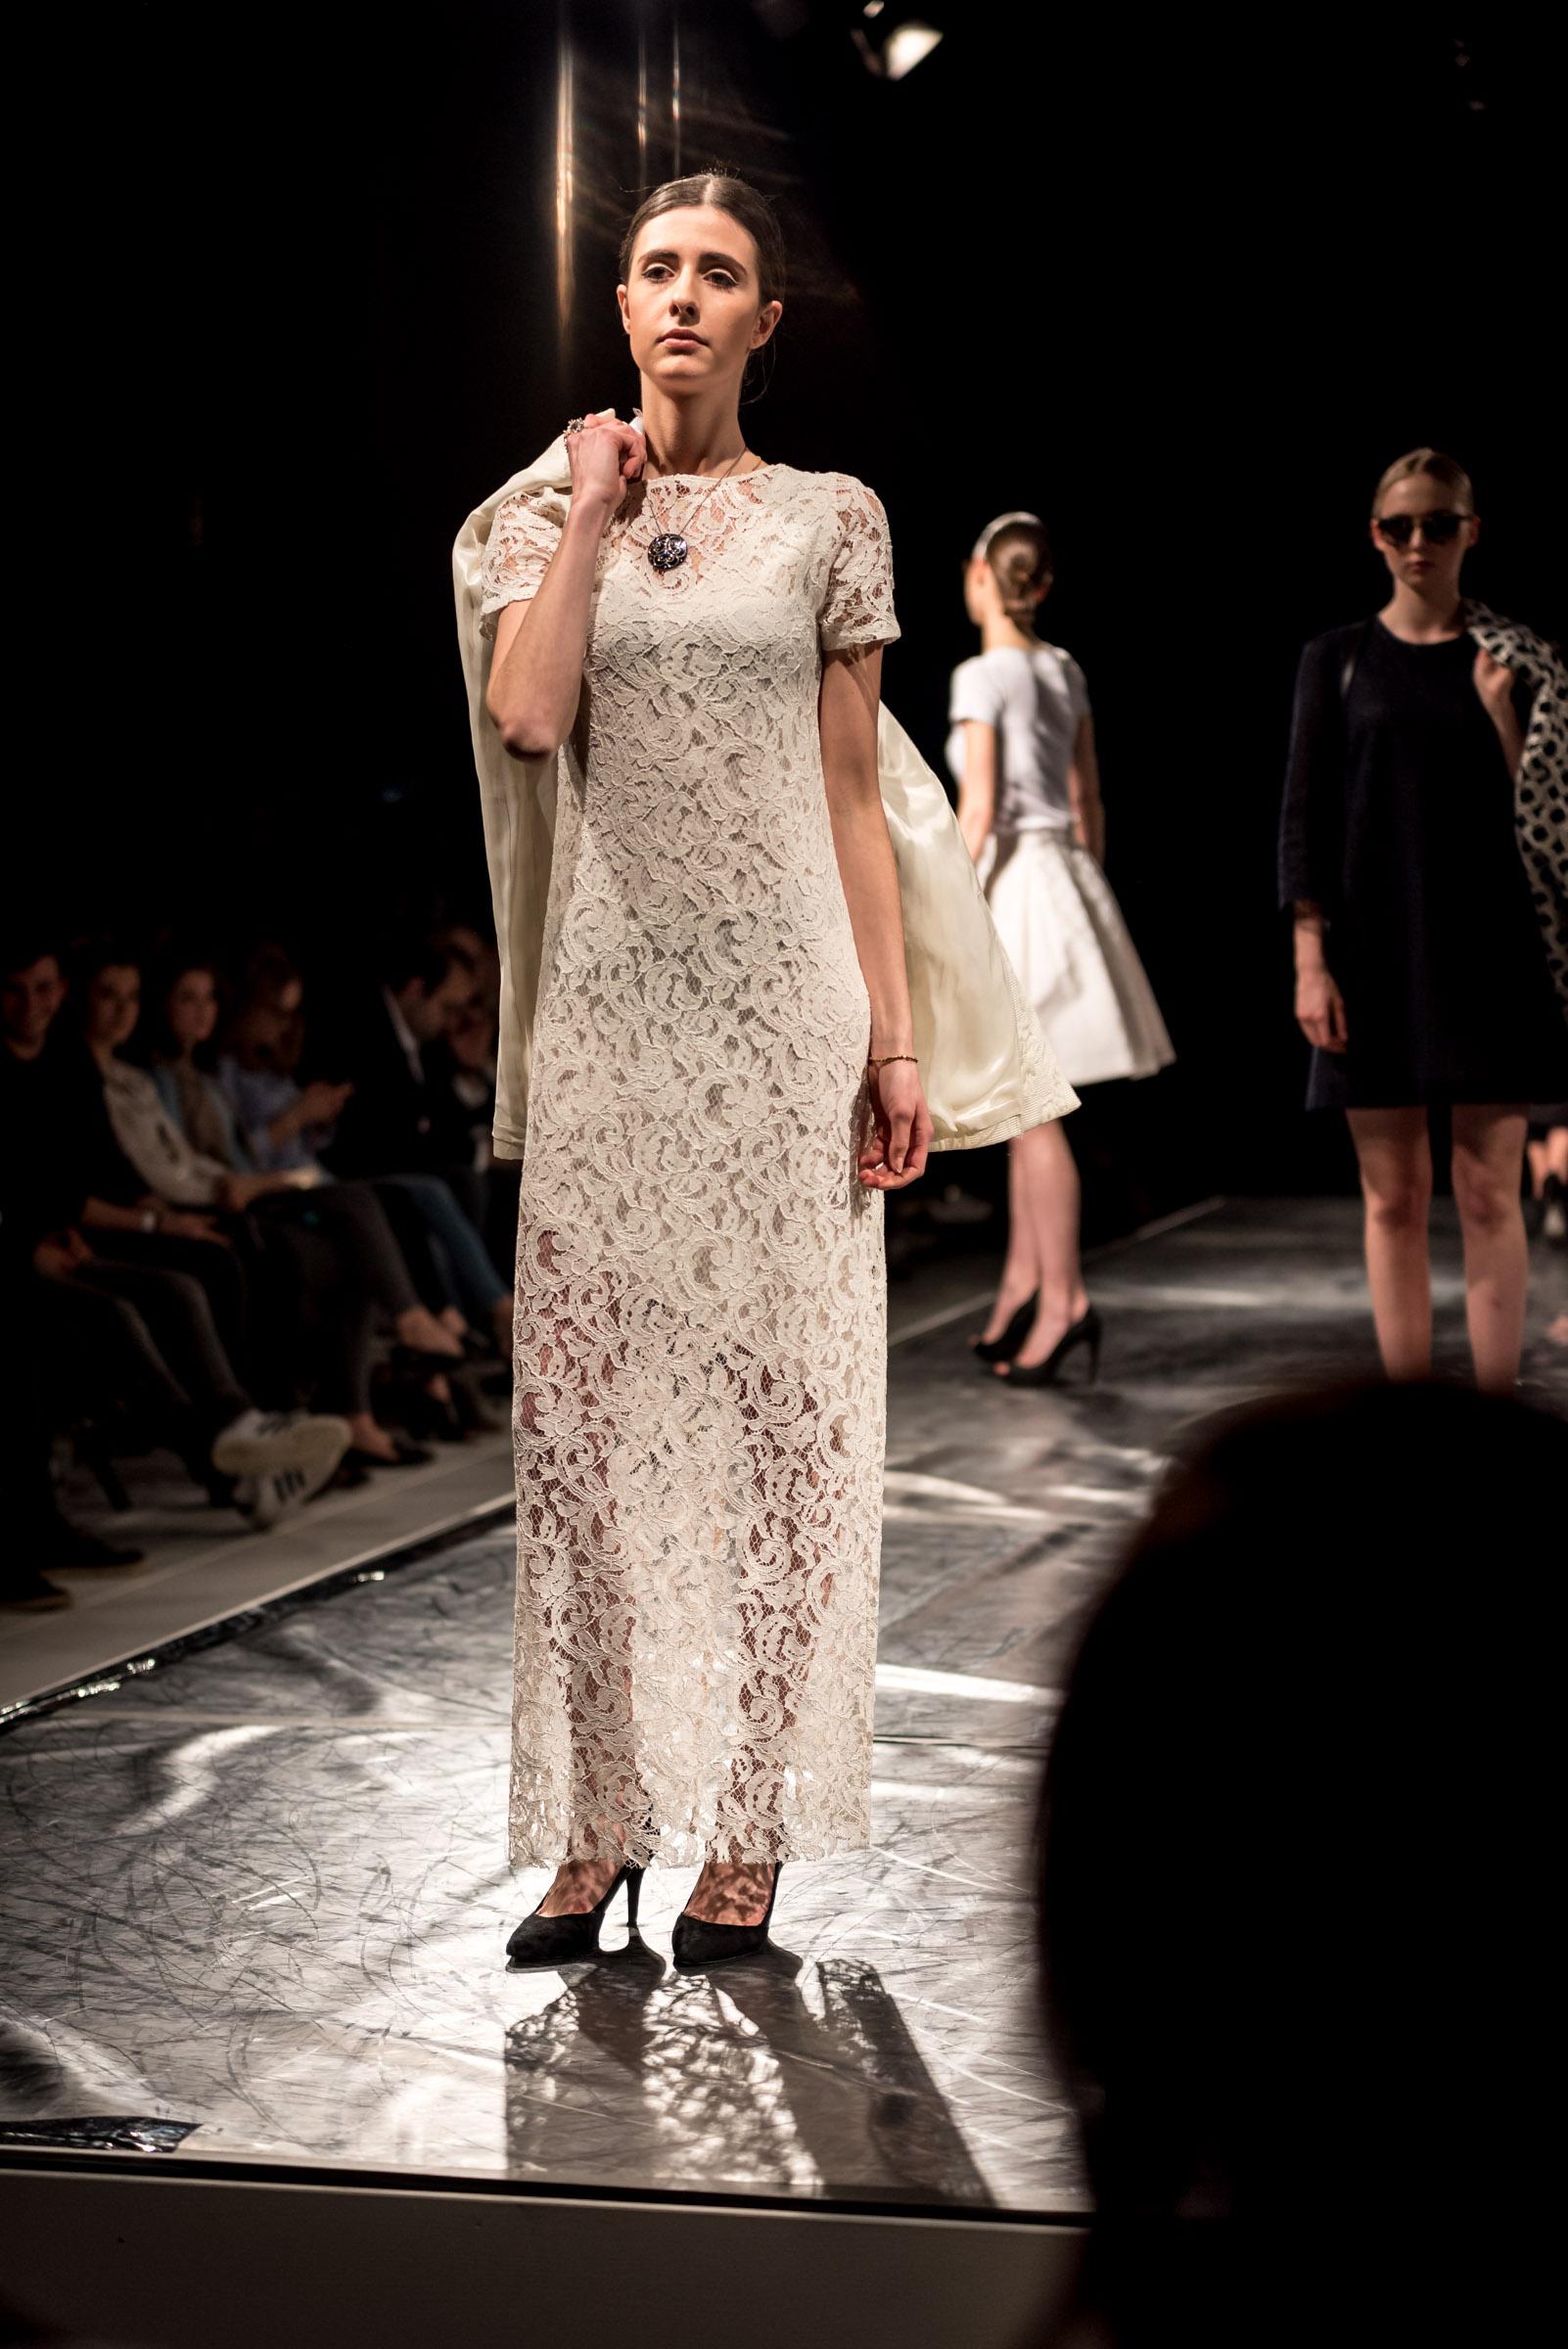 20160420_UnDress Fashion Show_223